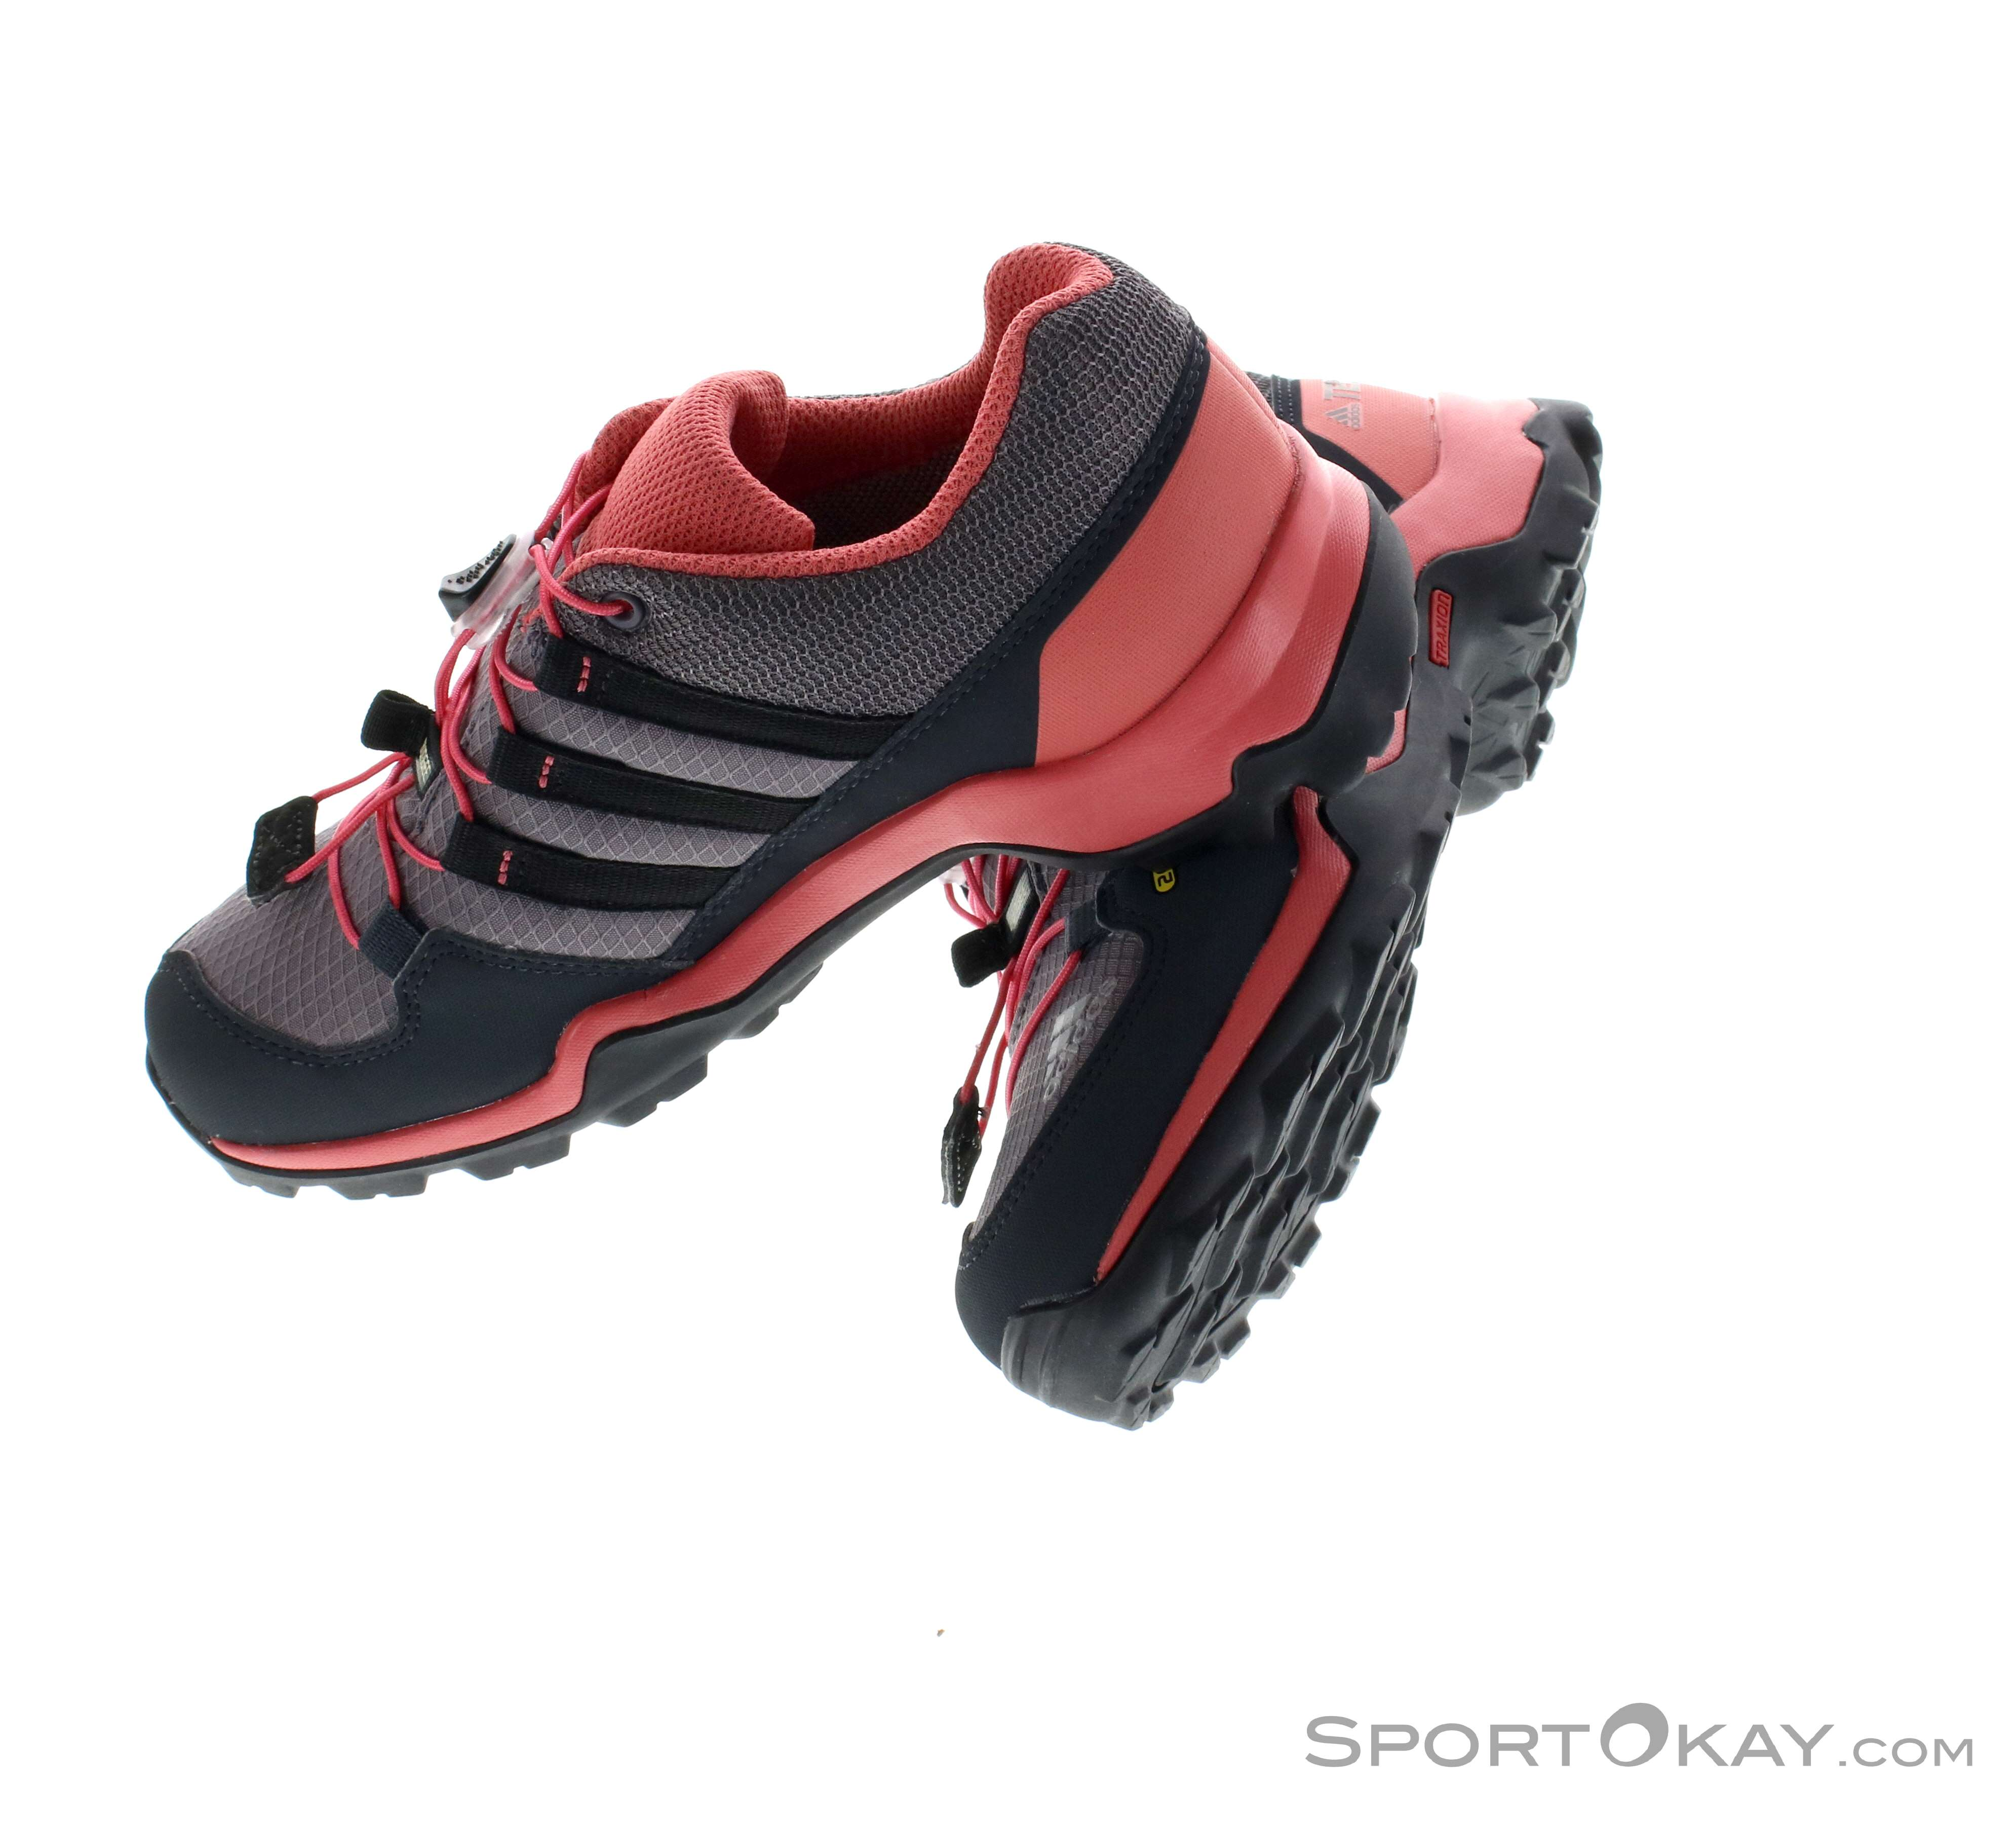 b91ca0181198c3 adidas Terrex GTX Kids Trekking Shoes Gore-Tex - Trekking Shoes ...